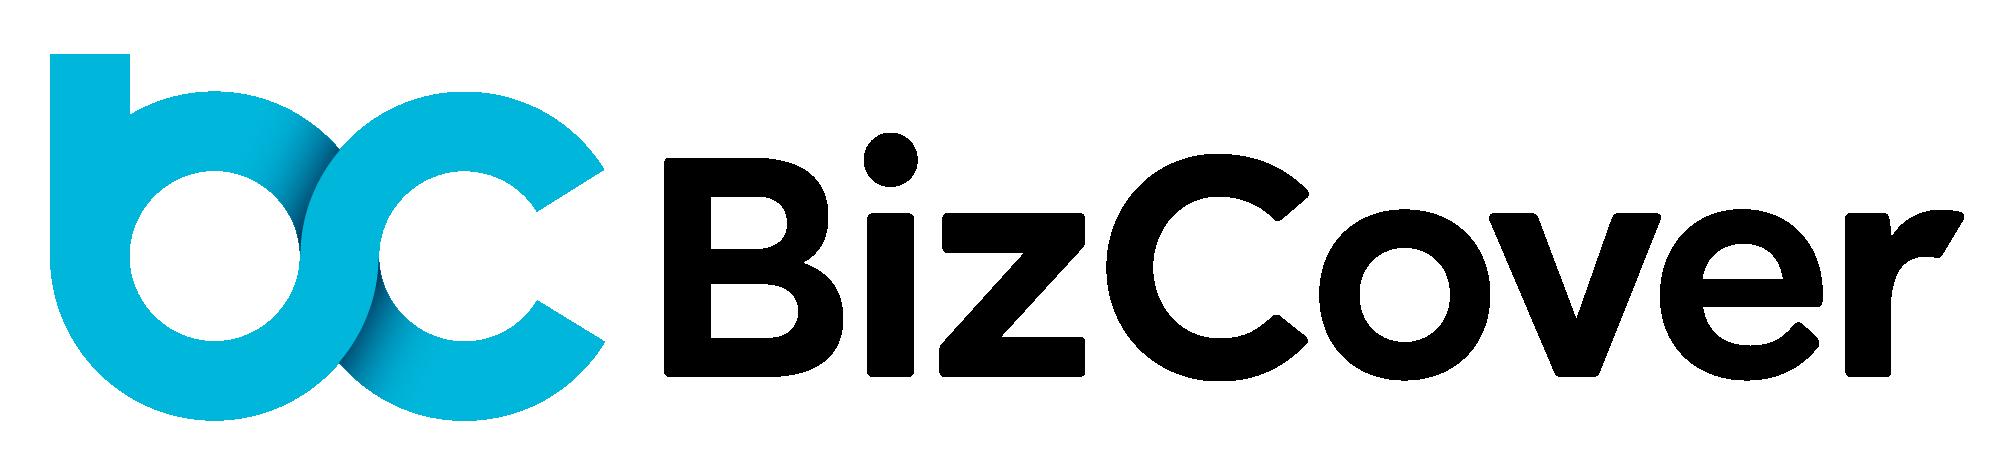 BizCover_Web_Logo.png